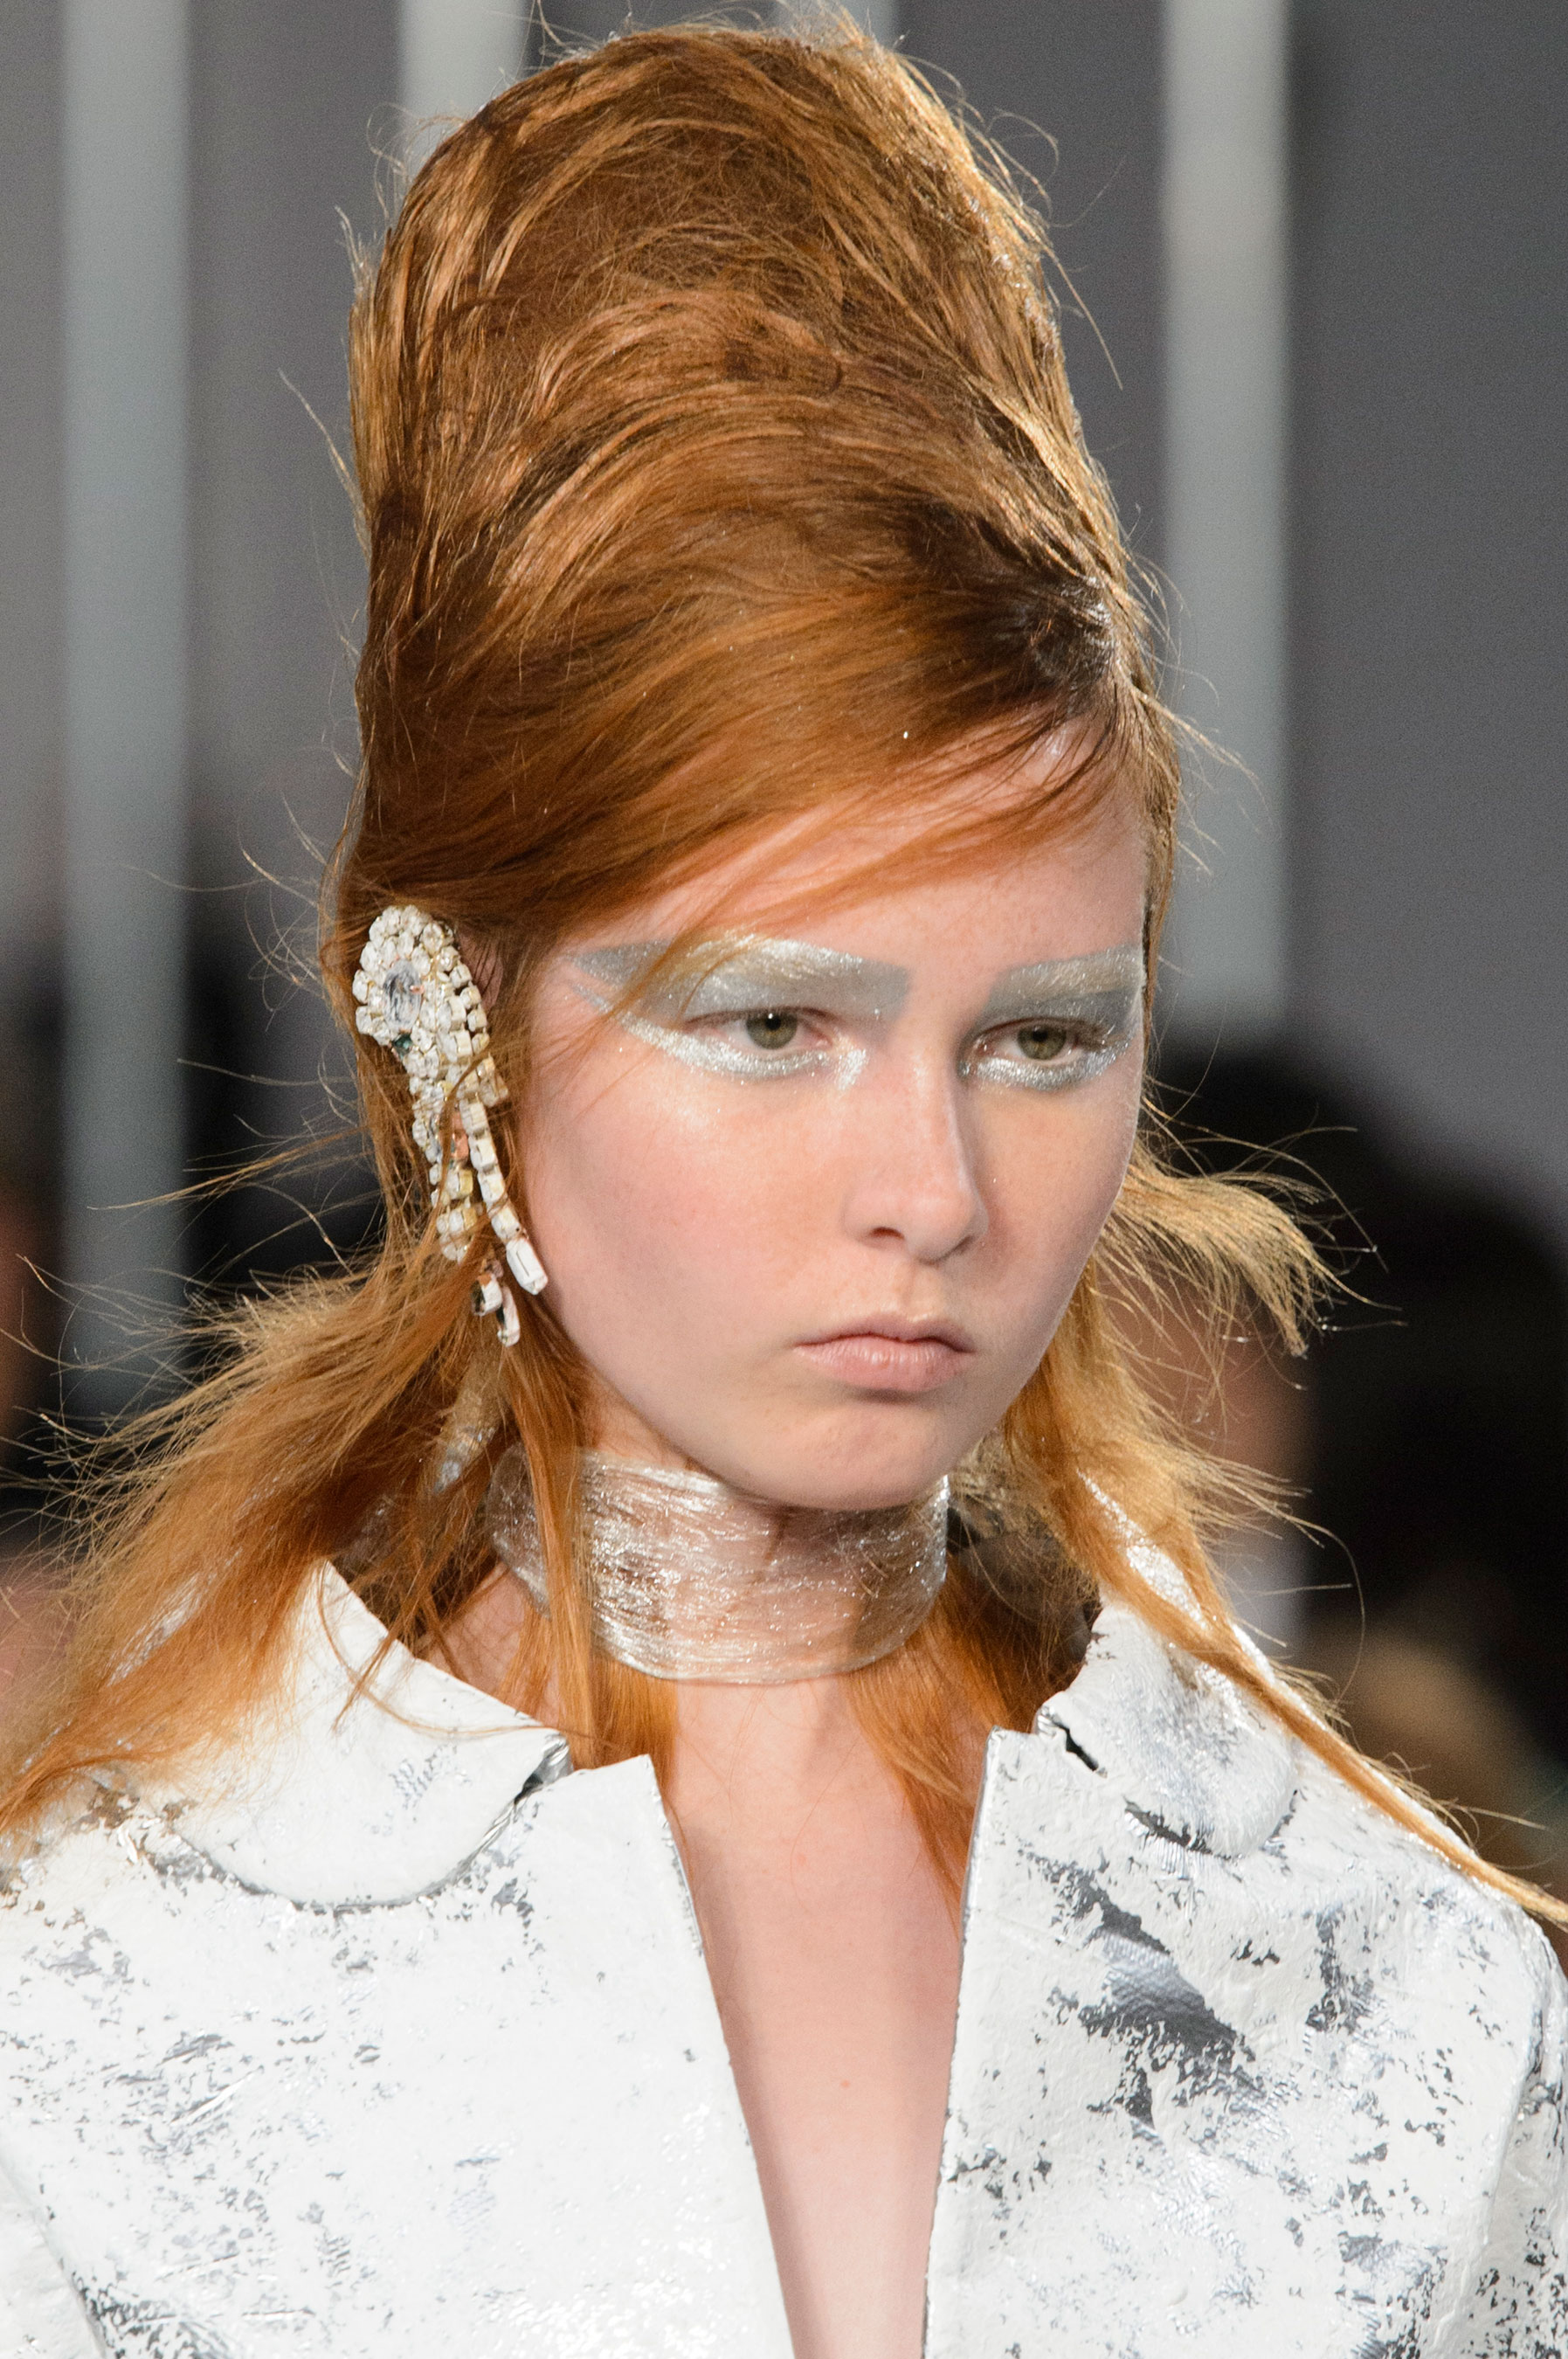 Maison-Margiela-spring-2016-runway-beauty-fashion-show-the-impression-007